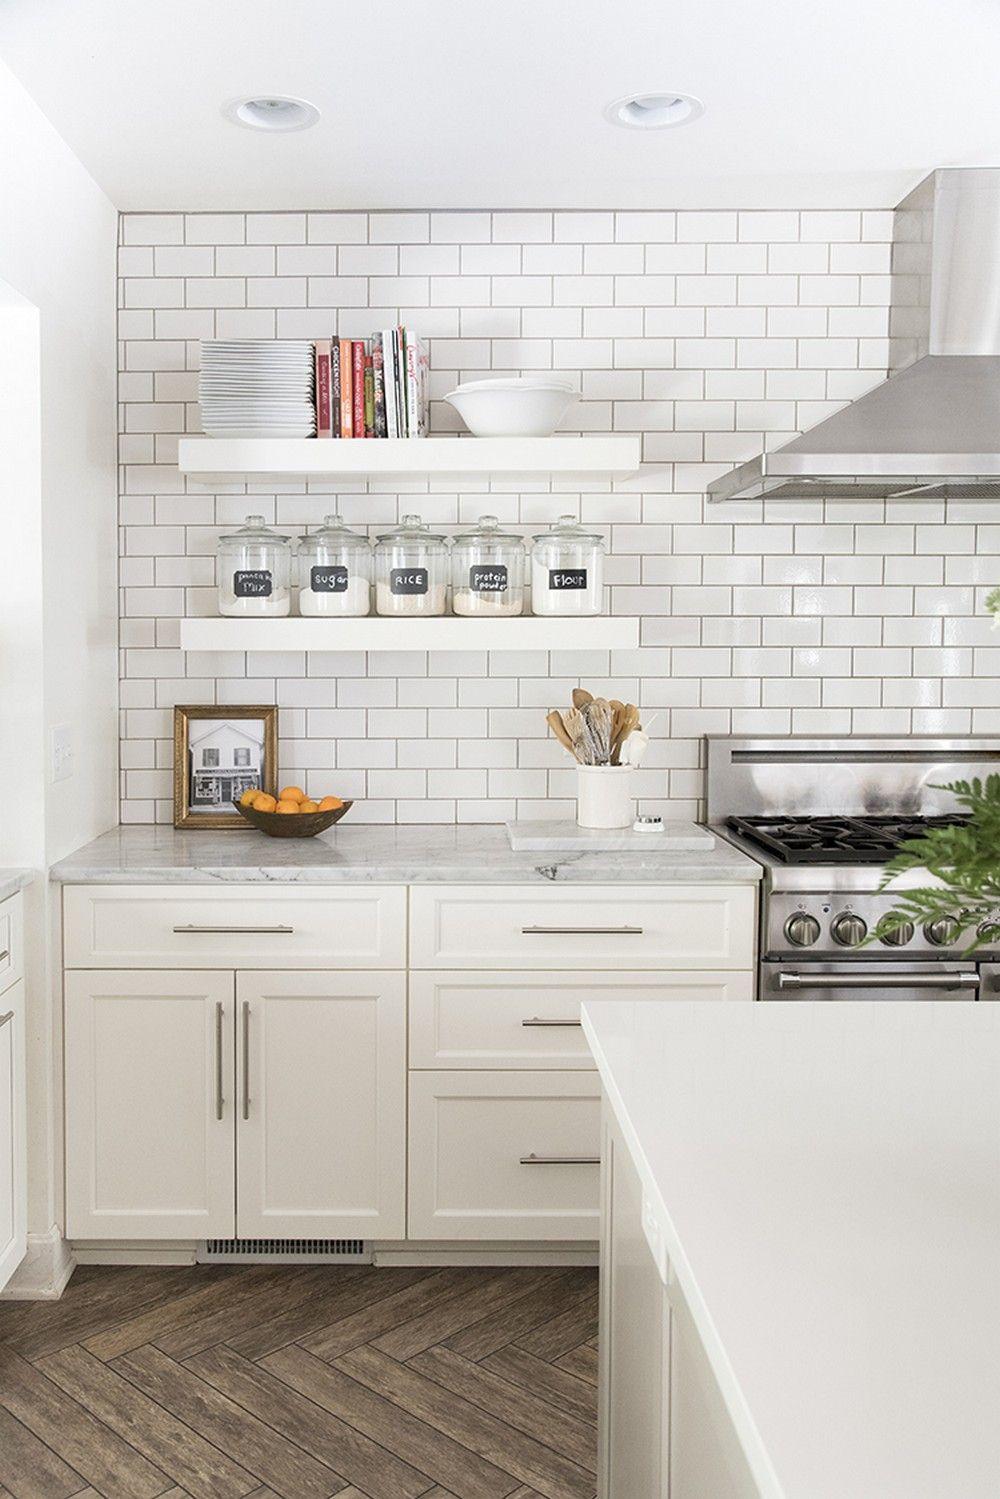 42 Modern Kitchen Designs with Open Shelving | Küche